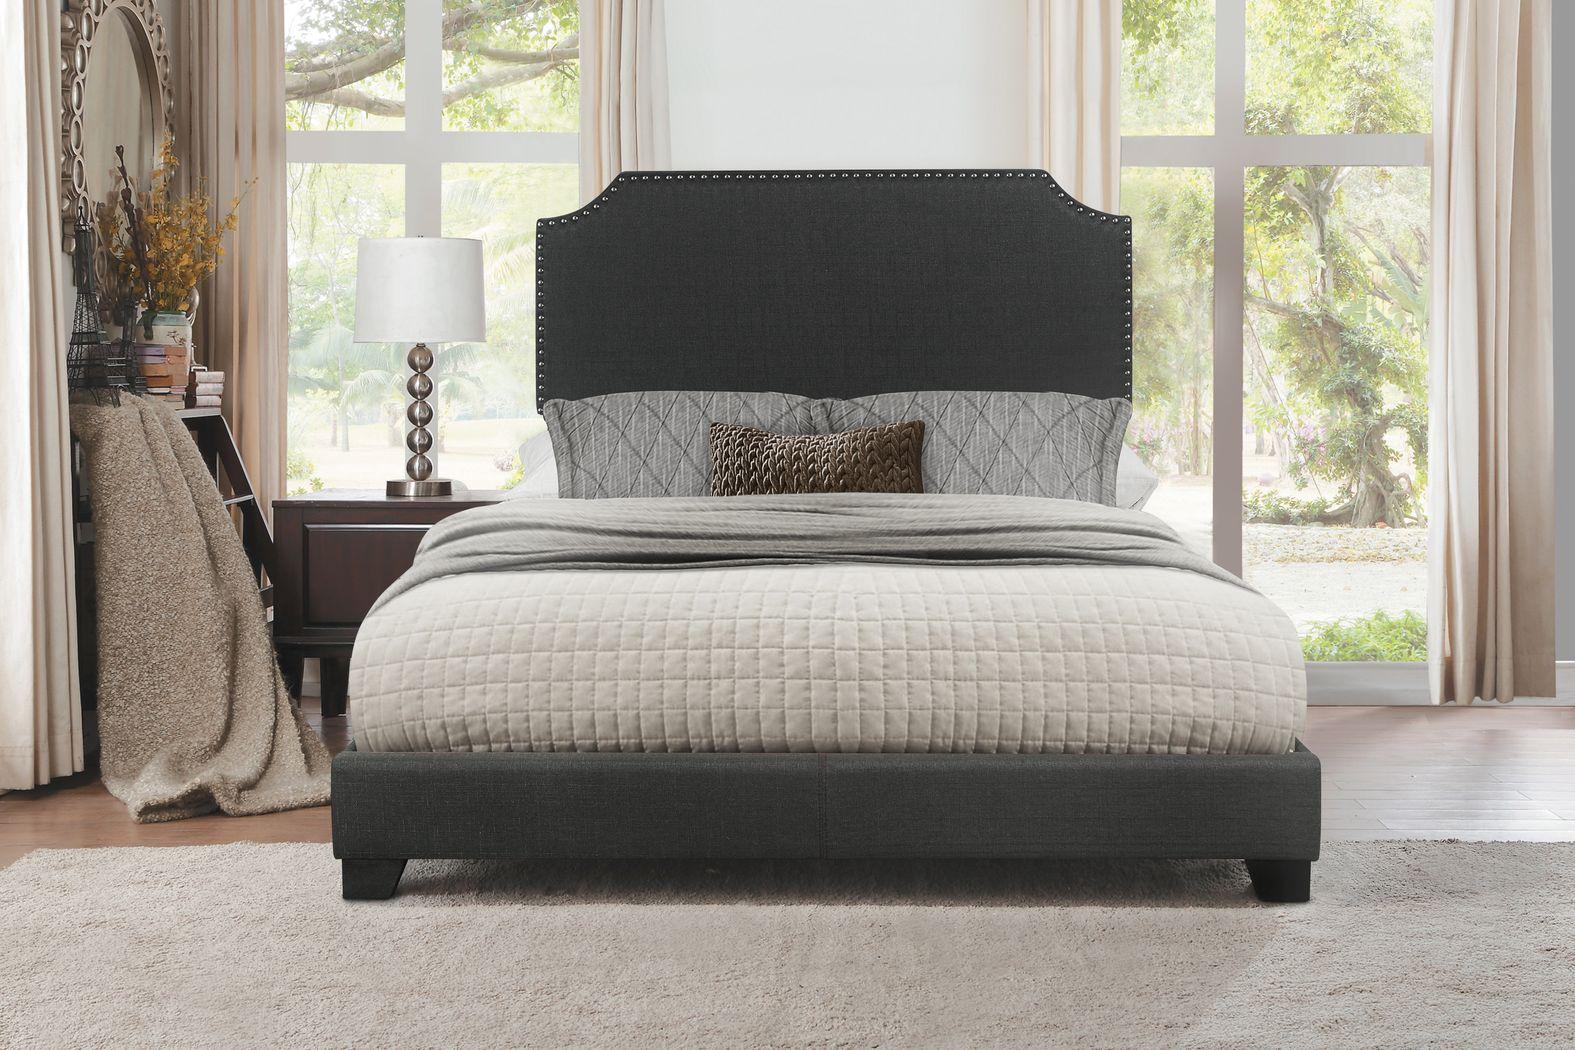 Carshalton Dark Gray Queen Upholstered Bed